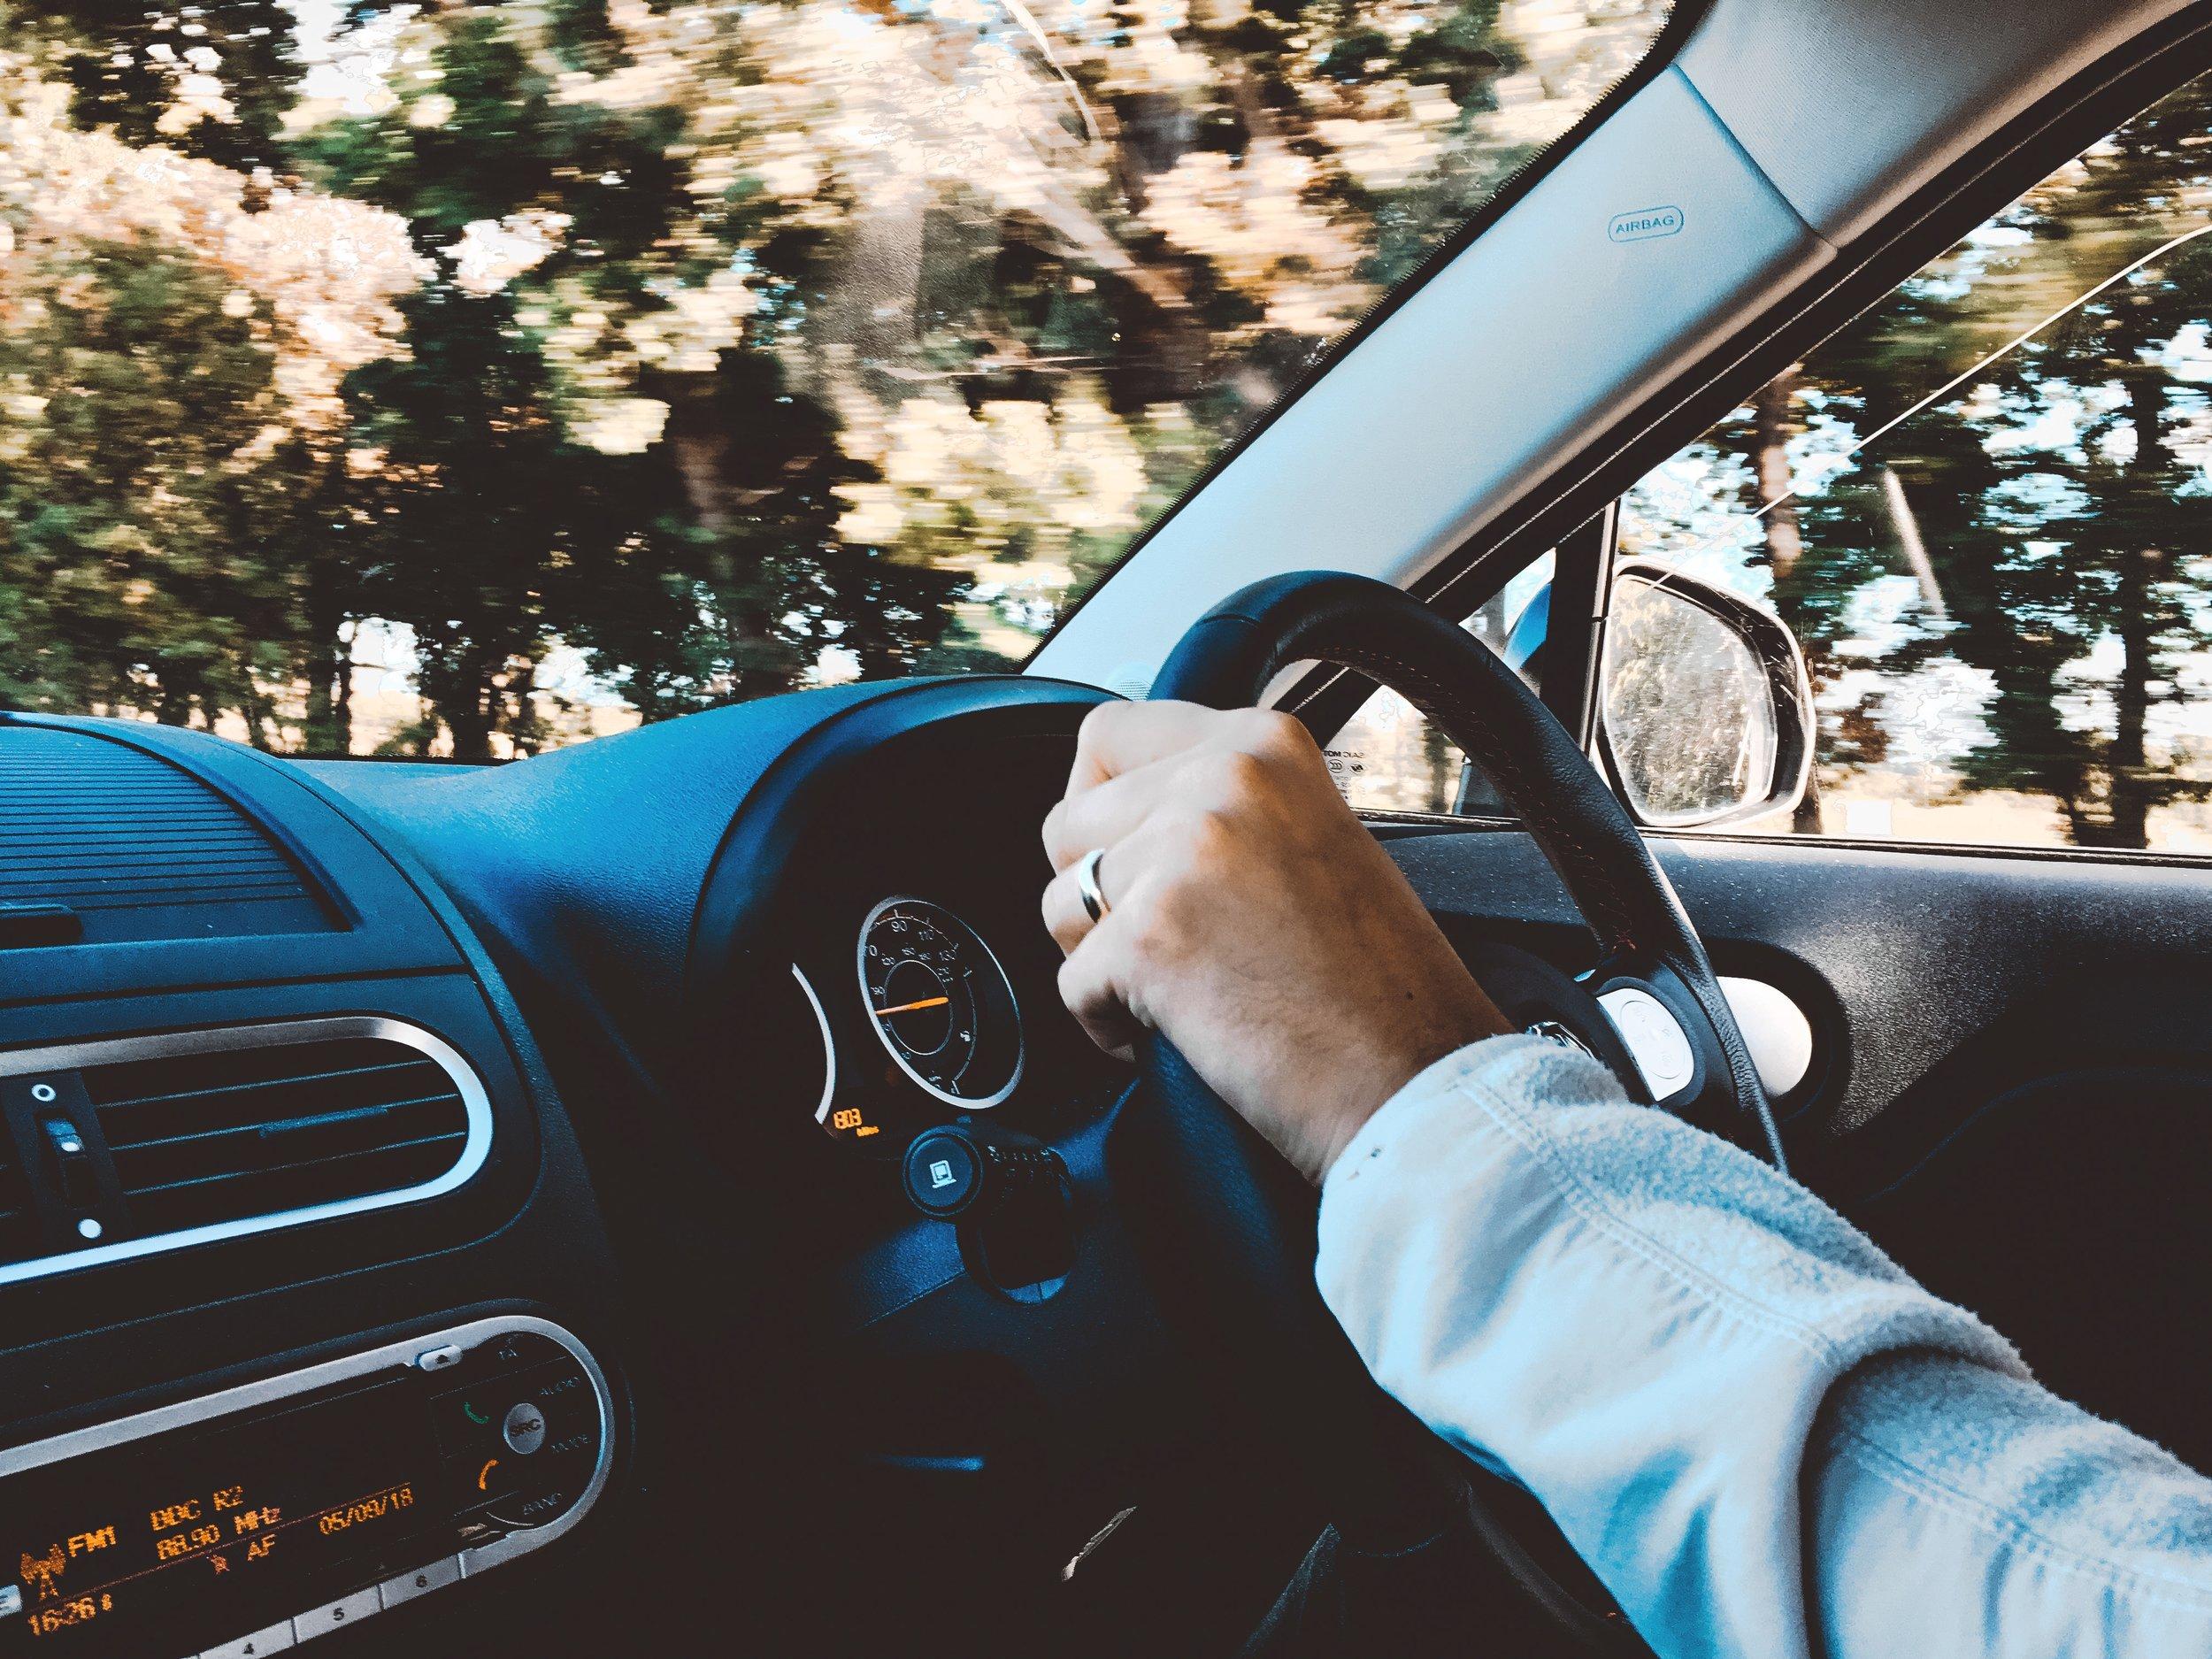 auto-automobile-blurred-background-1392621.jpg